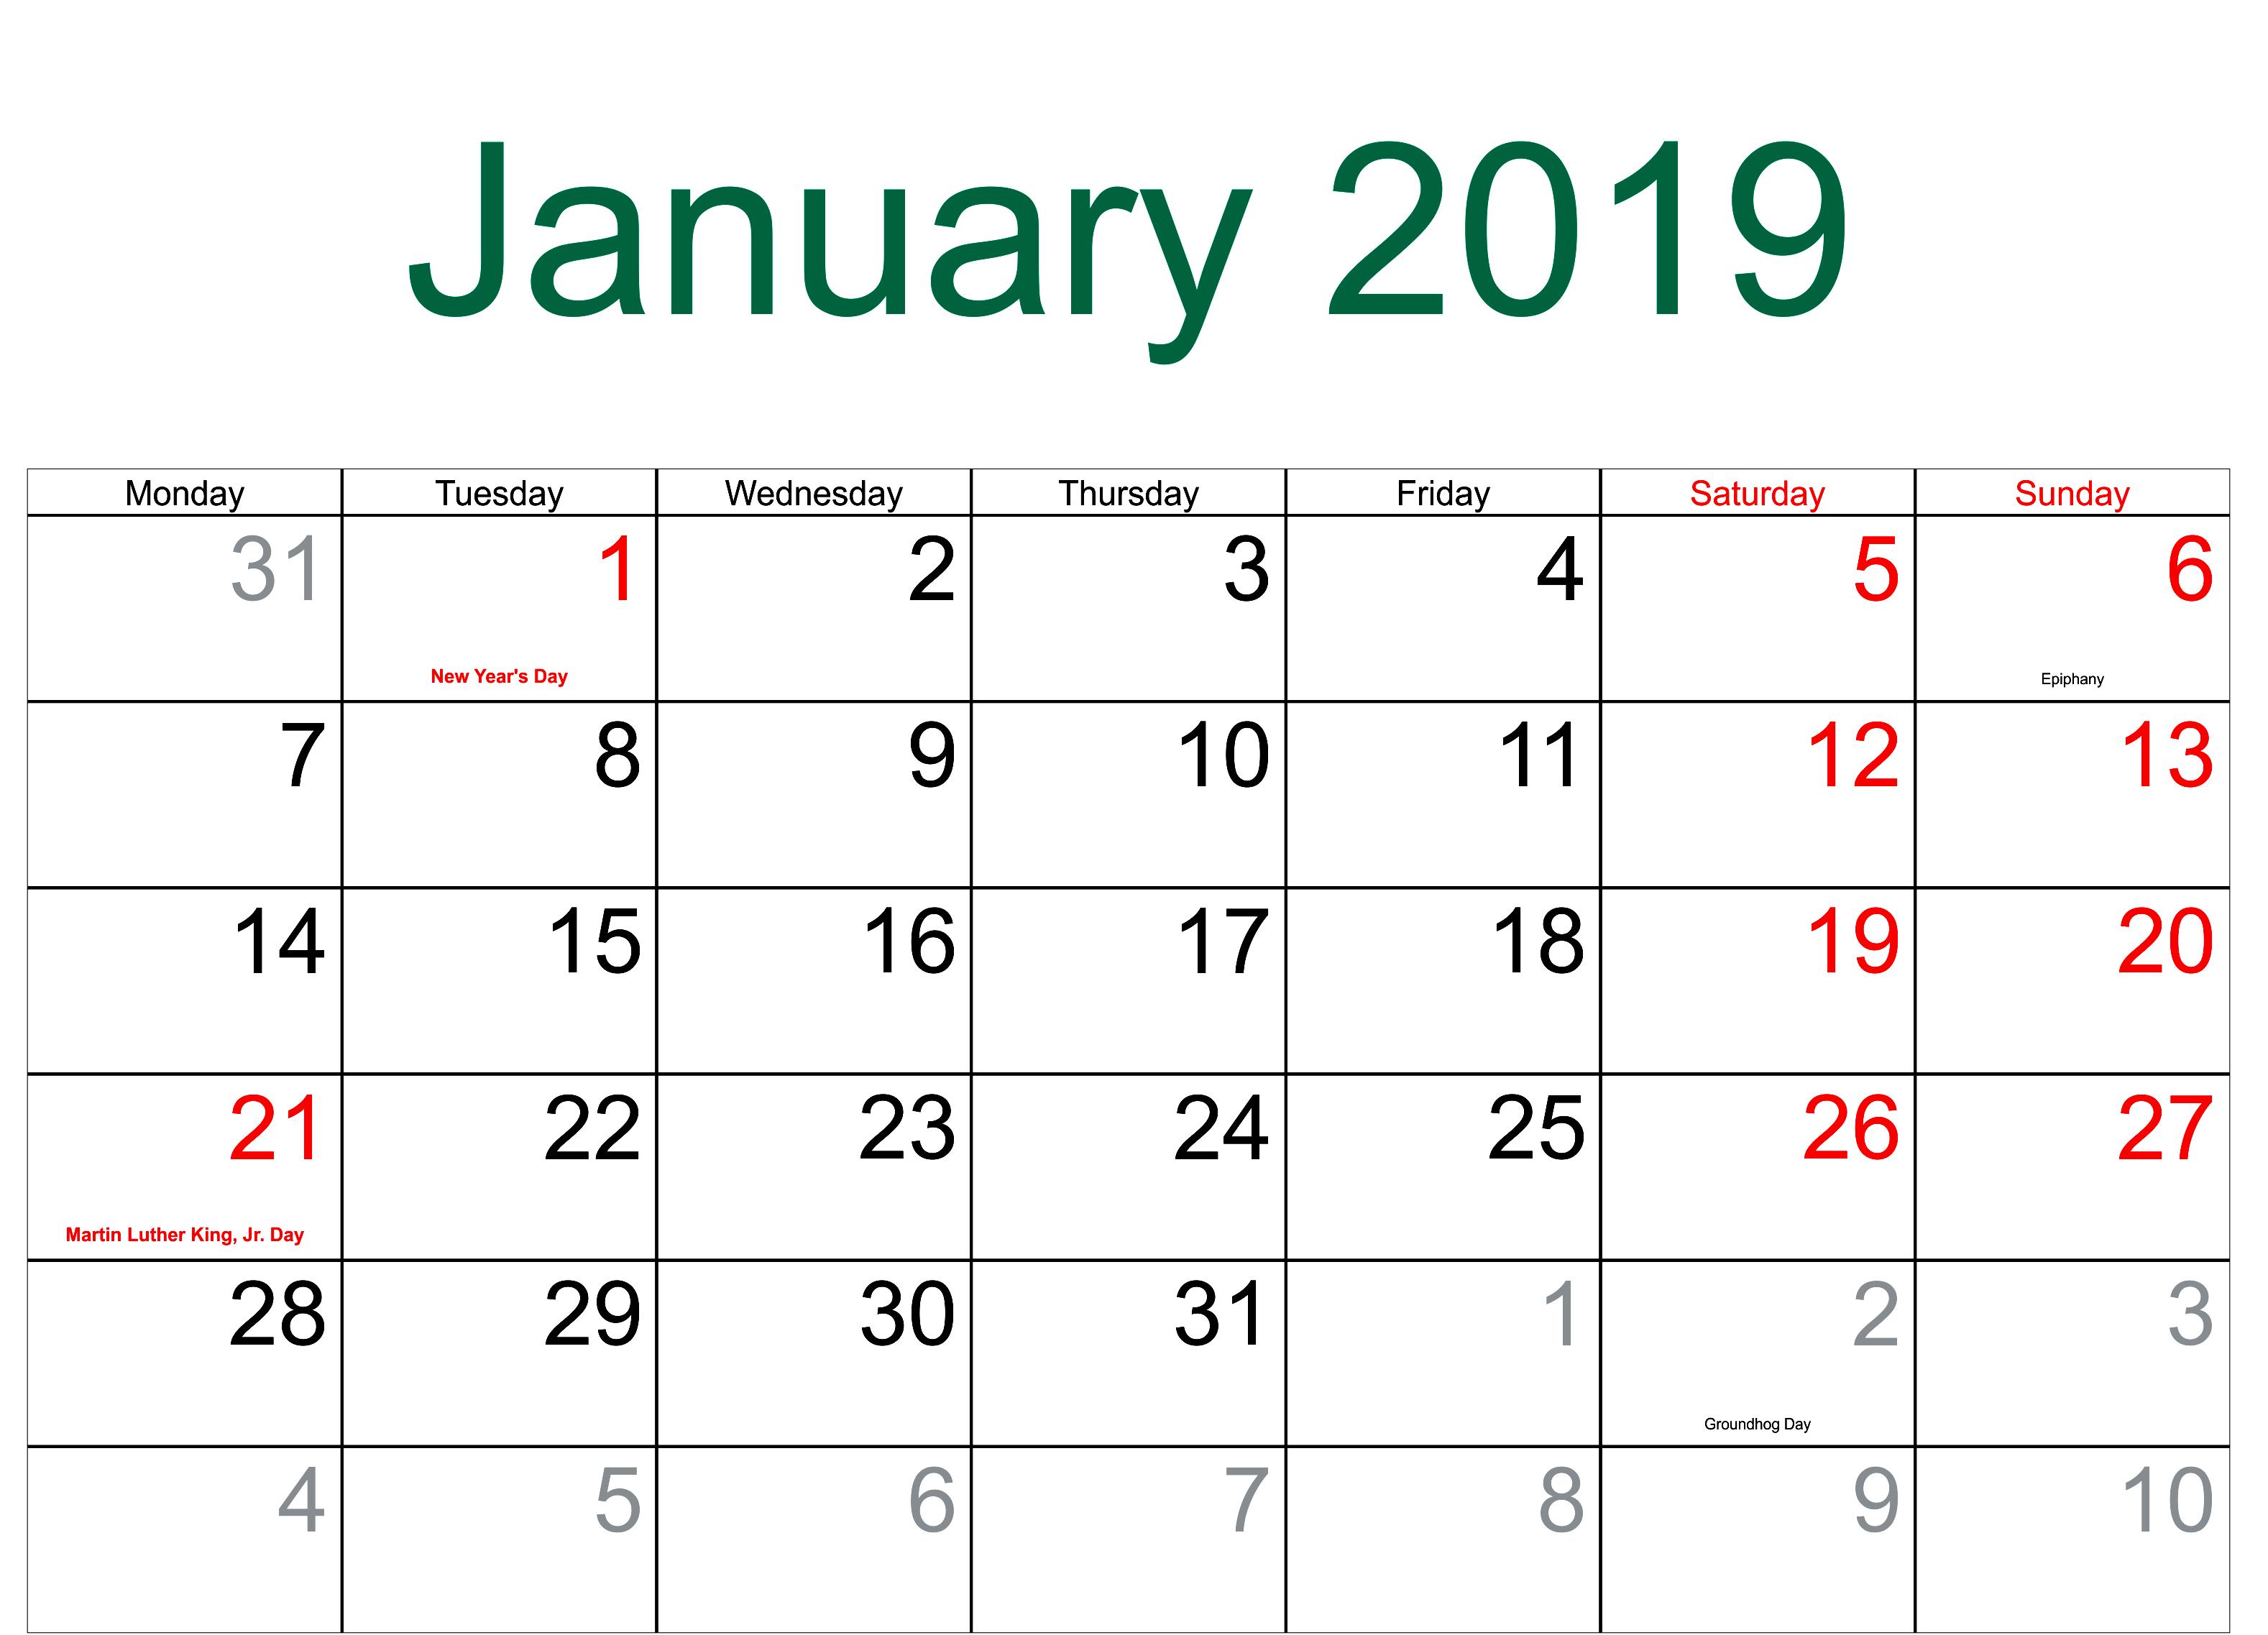 January 2019 Holidays Calendar